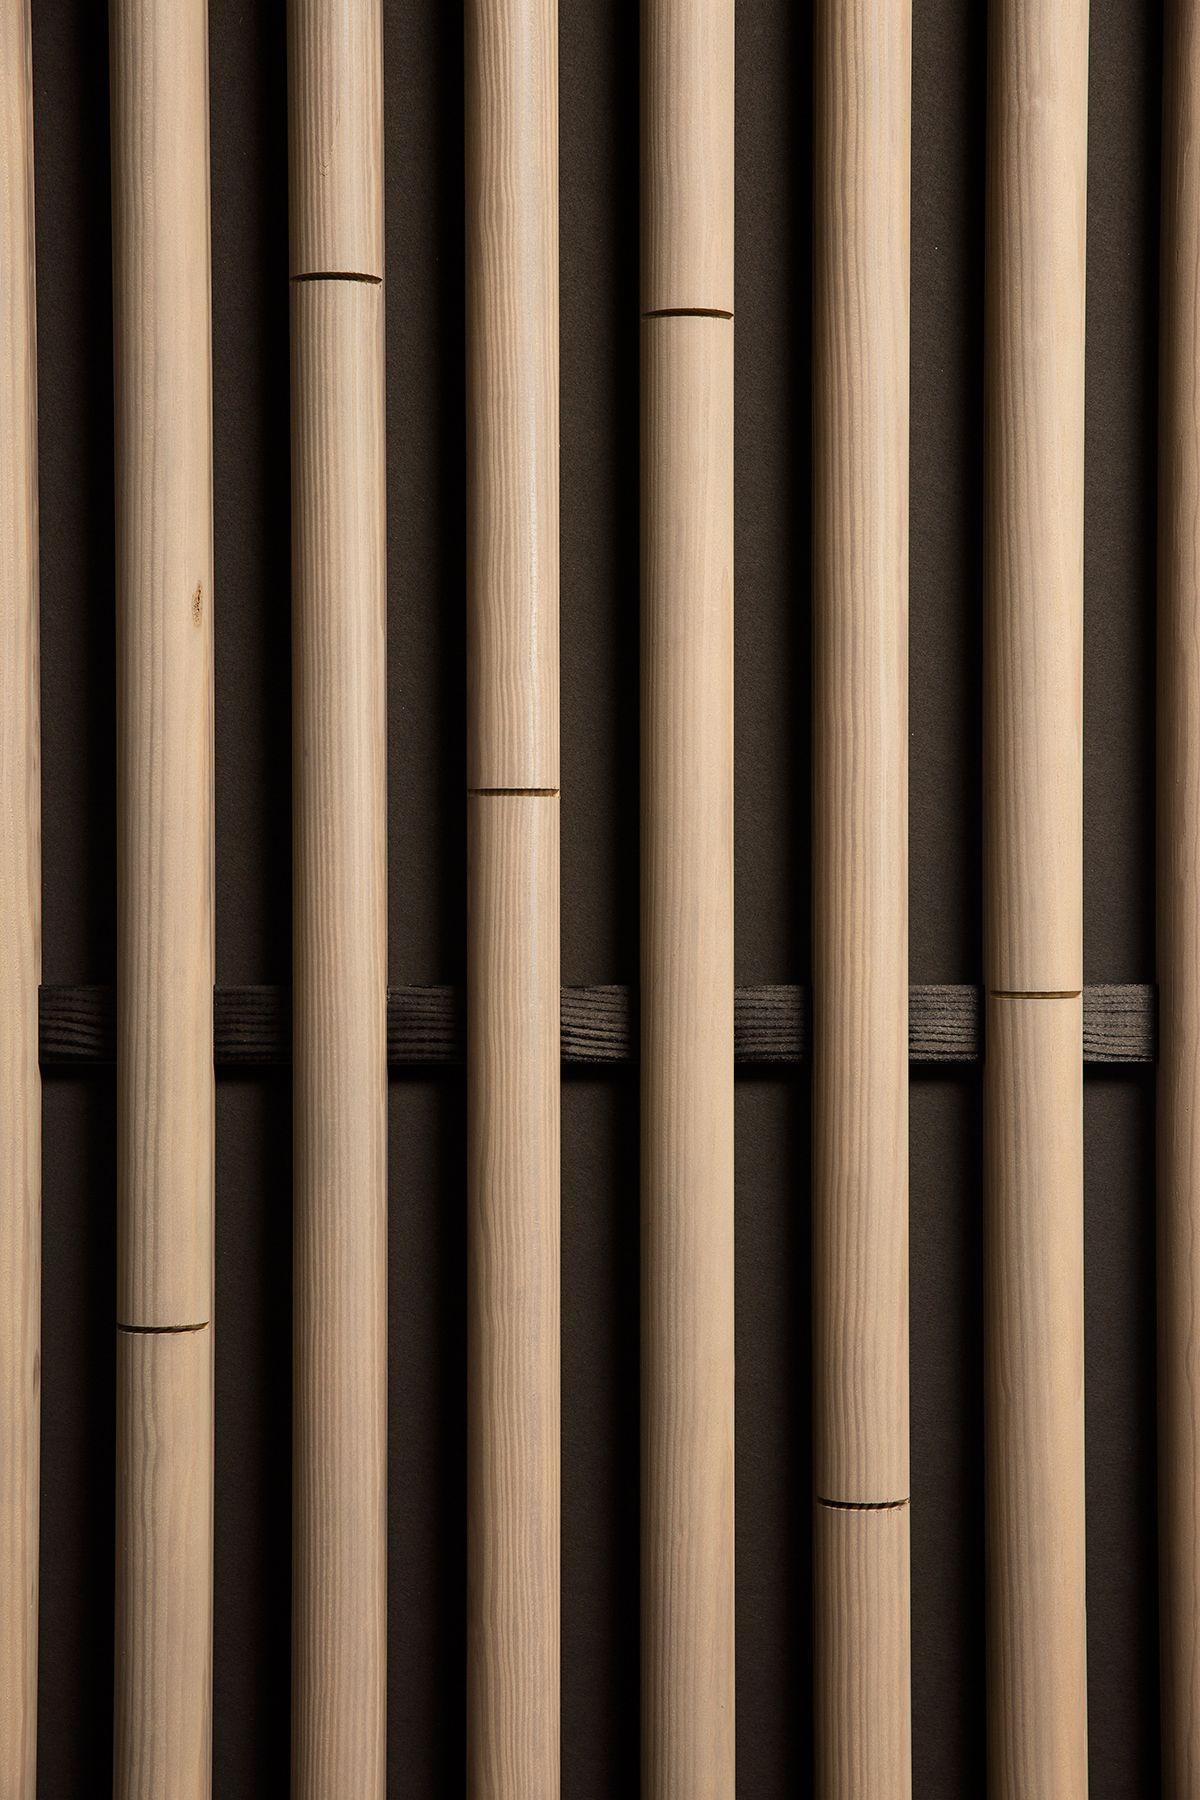 Bamboo 3d Laudescher Woodlabo In 2020 Bamboo Texture Bamboo Acoustic Panels